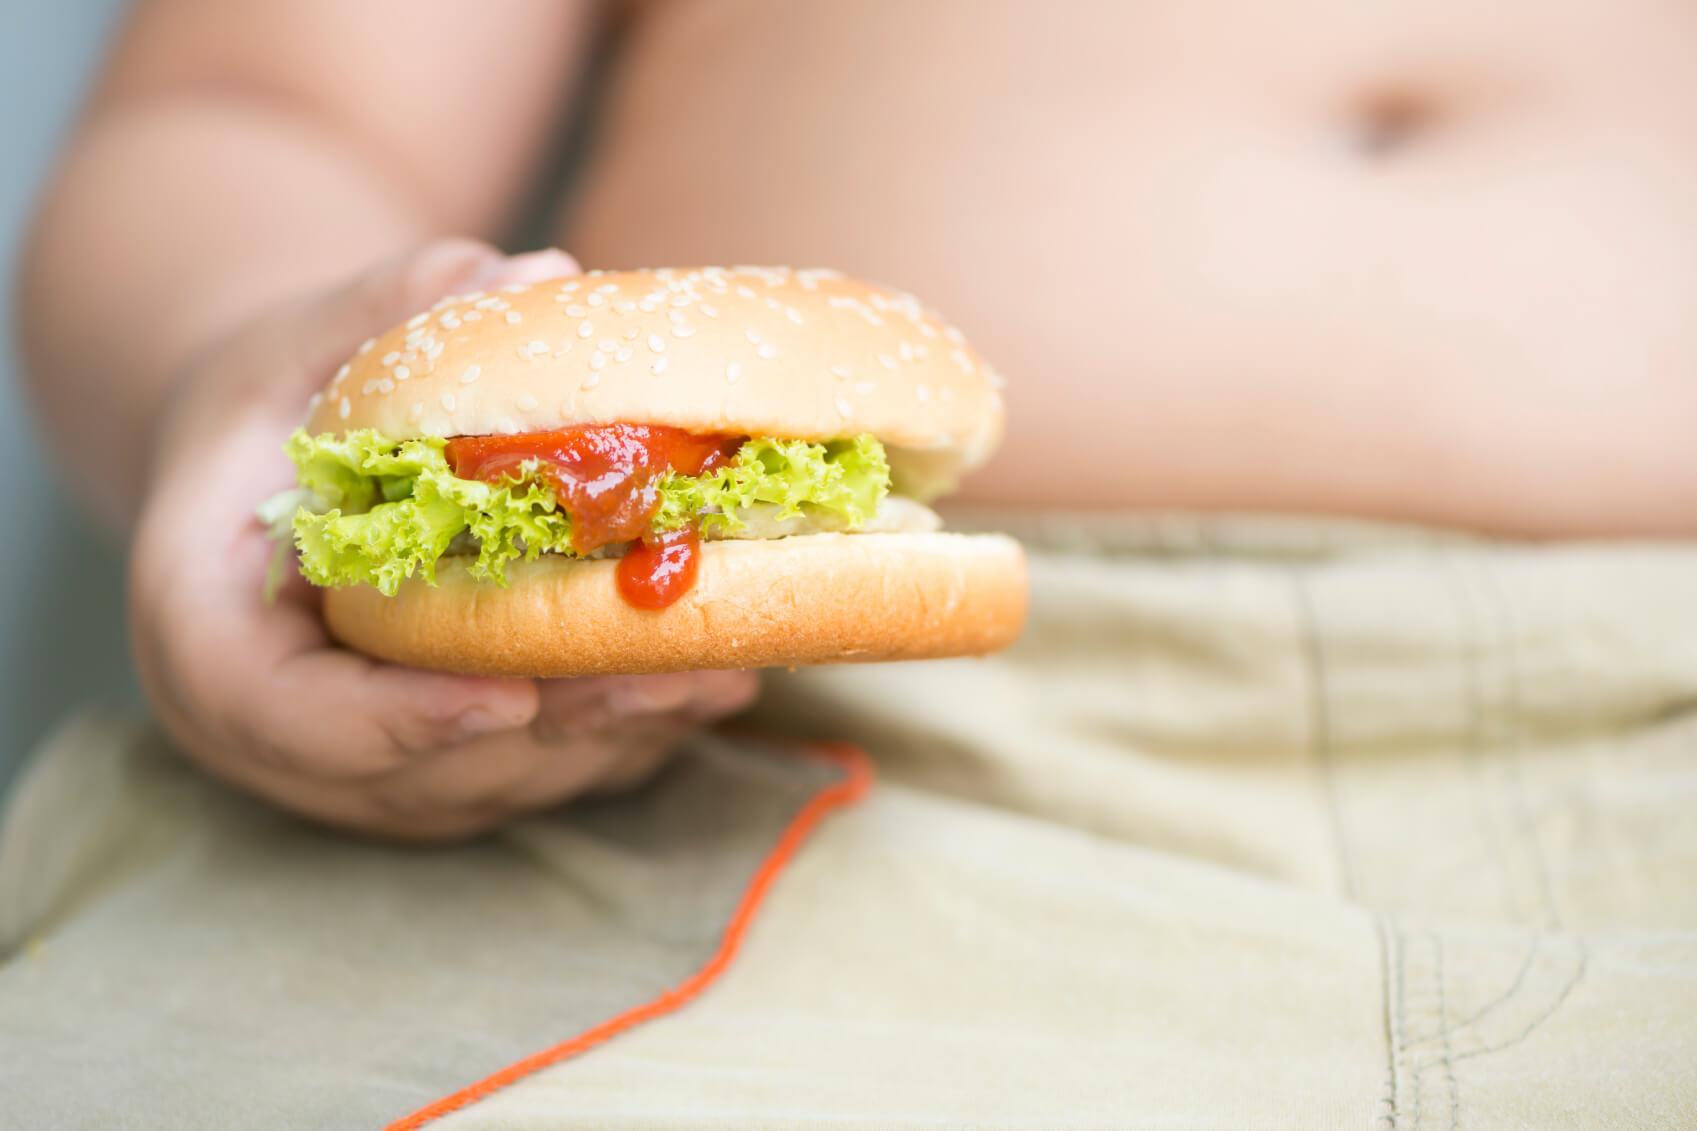 chicken cheese Hamburger on obese fat boy hand